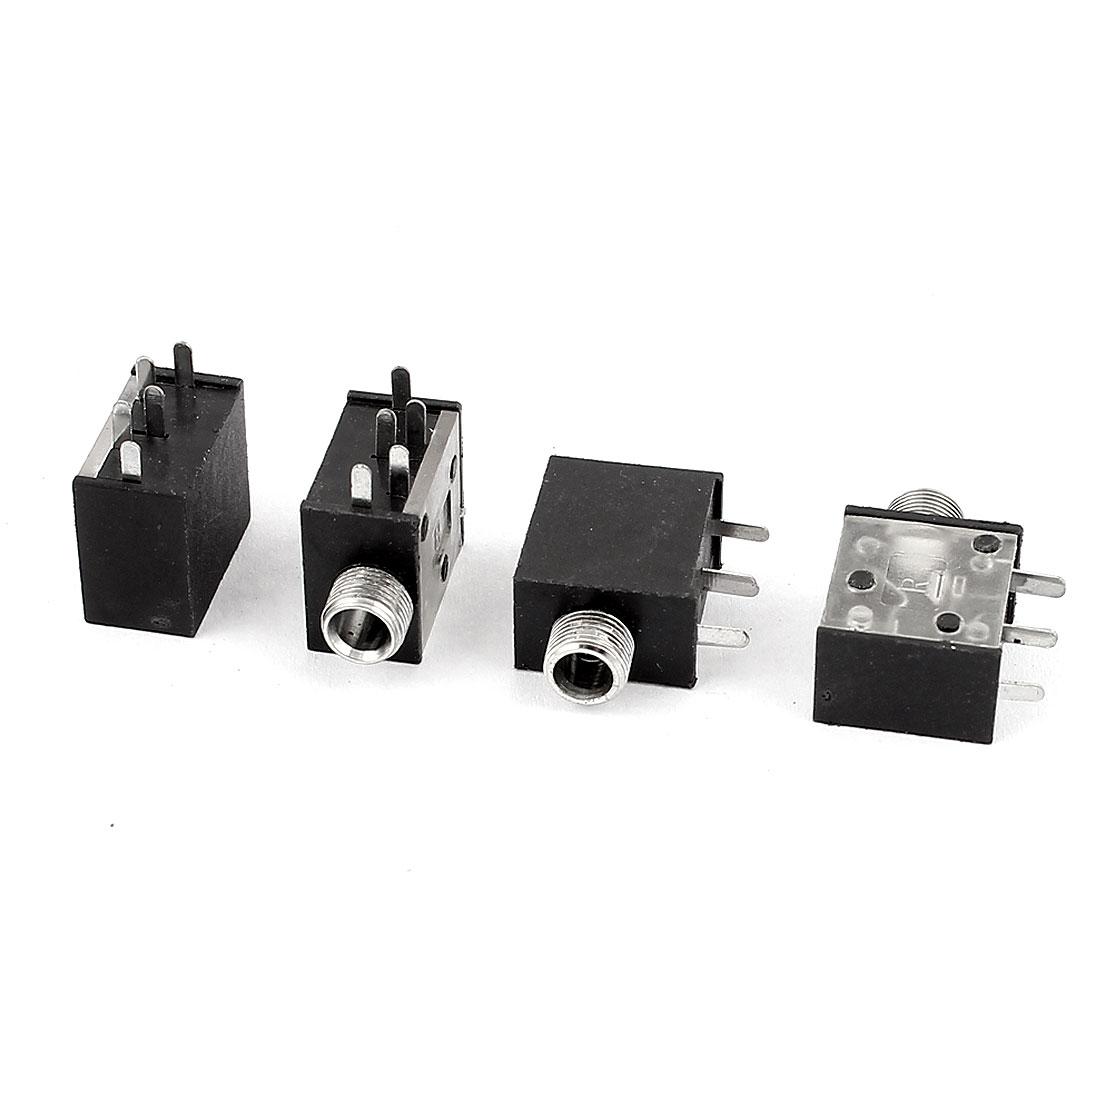 4 Pcs 3.5mm Female PCB Mount 5 Pin Terminals Audio Jack Socket Connector